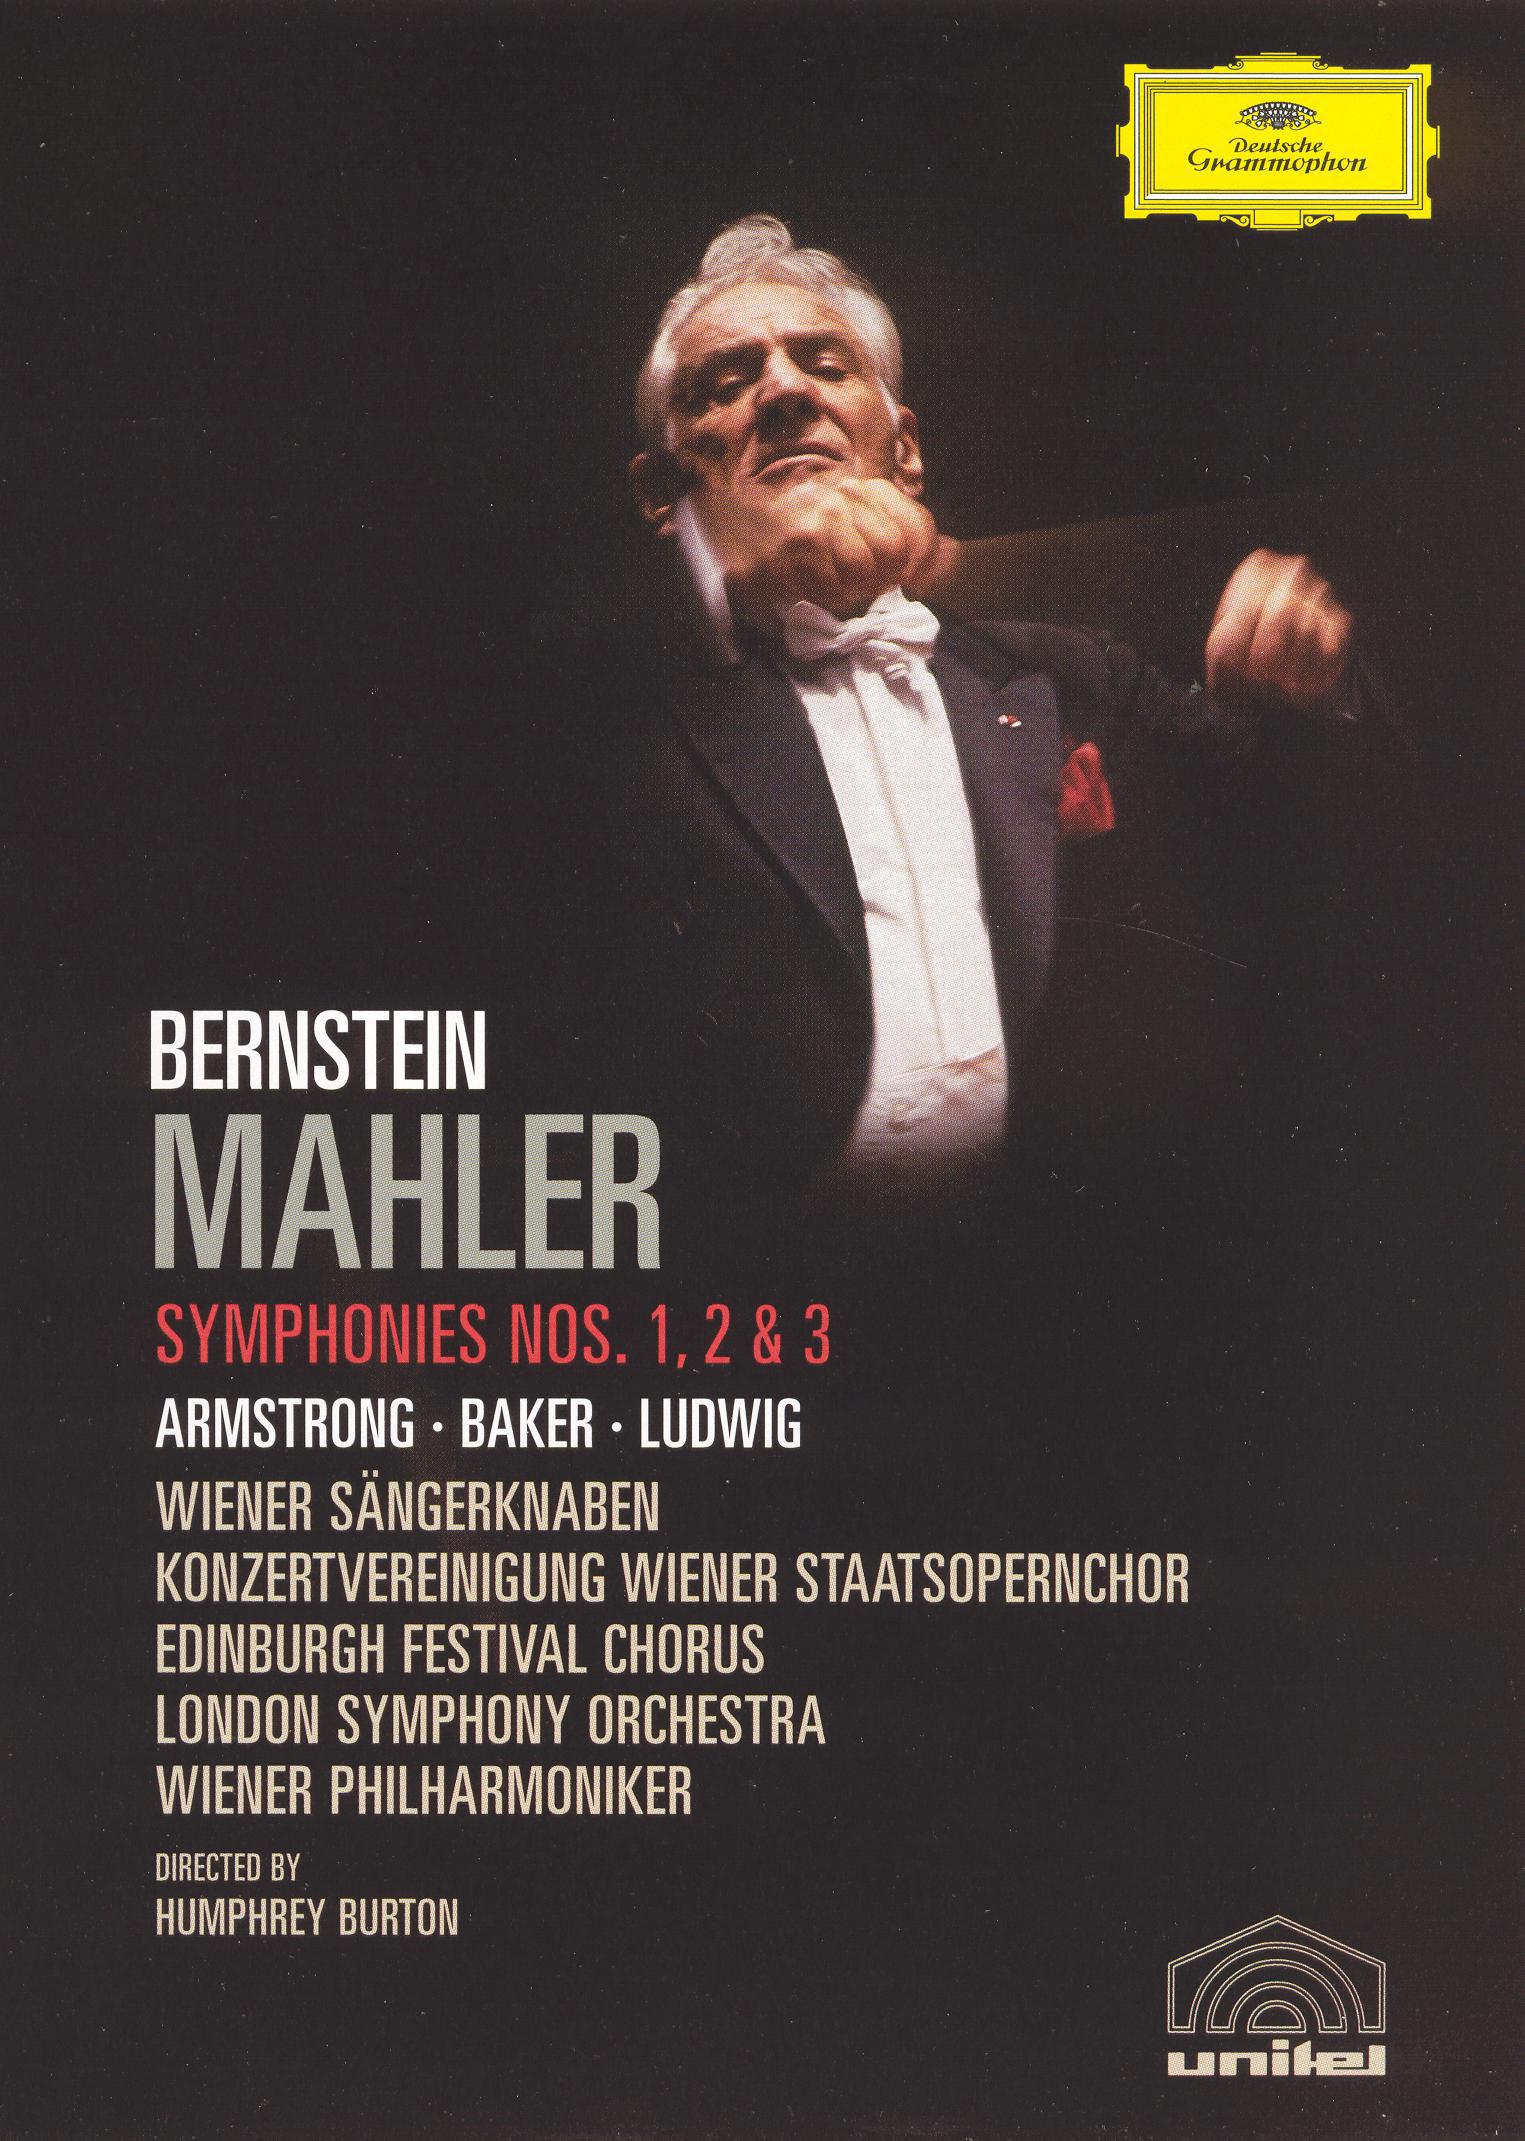 Bernstein: Mahler - Symphonies 1, 2 & 3